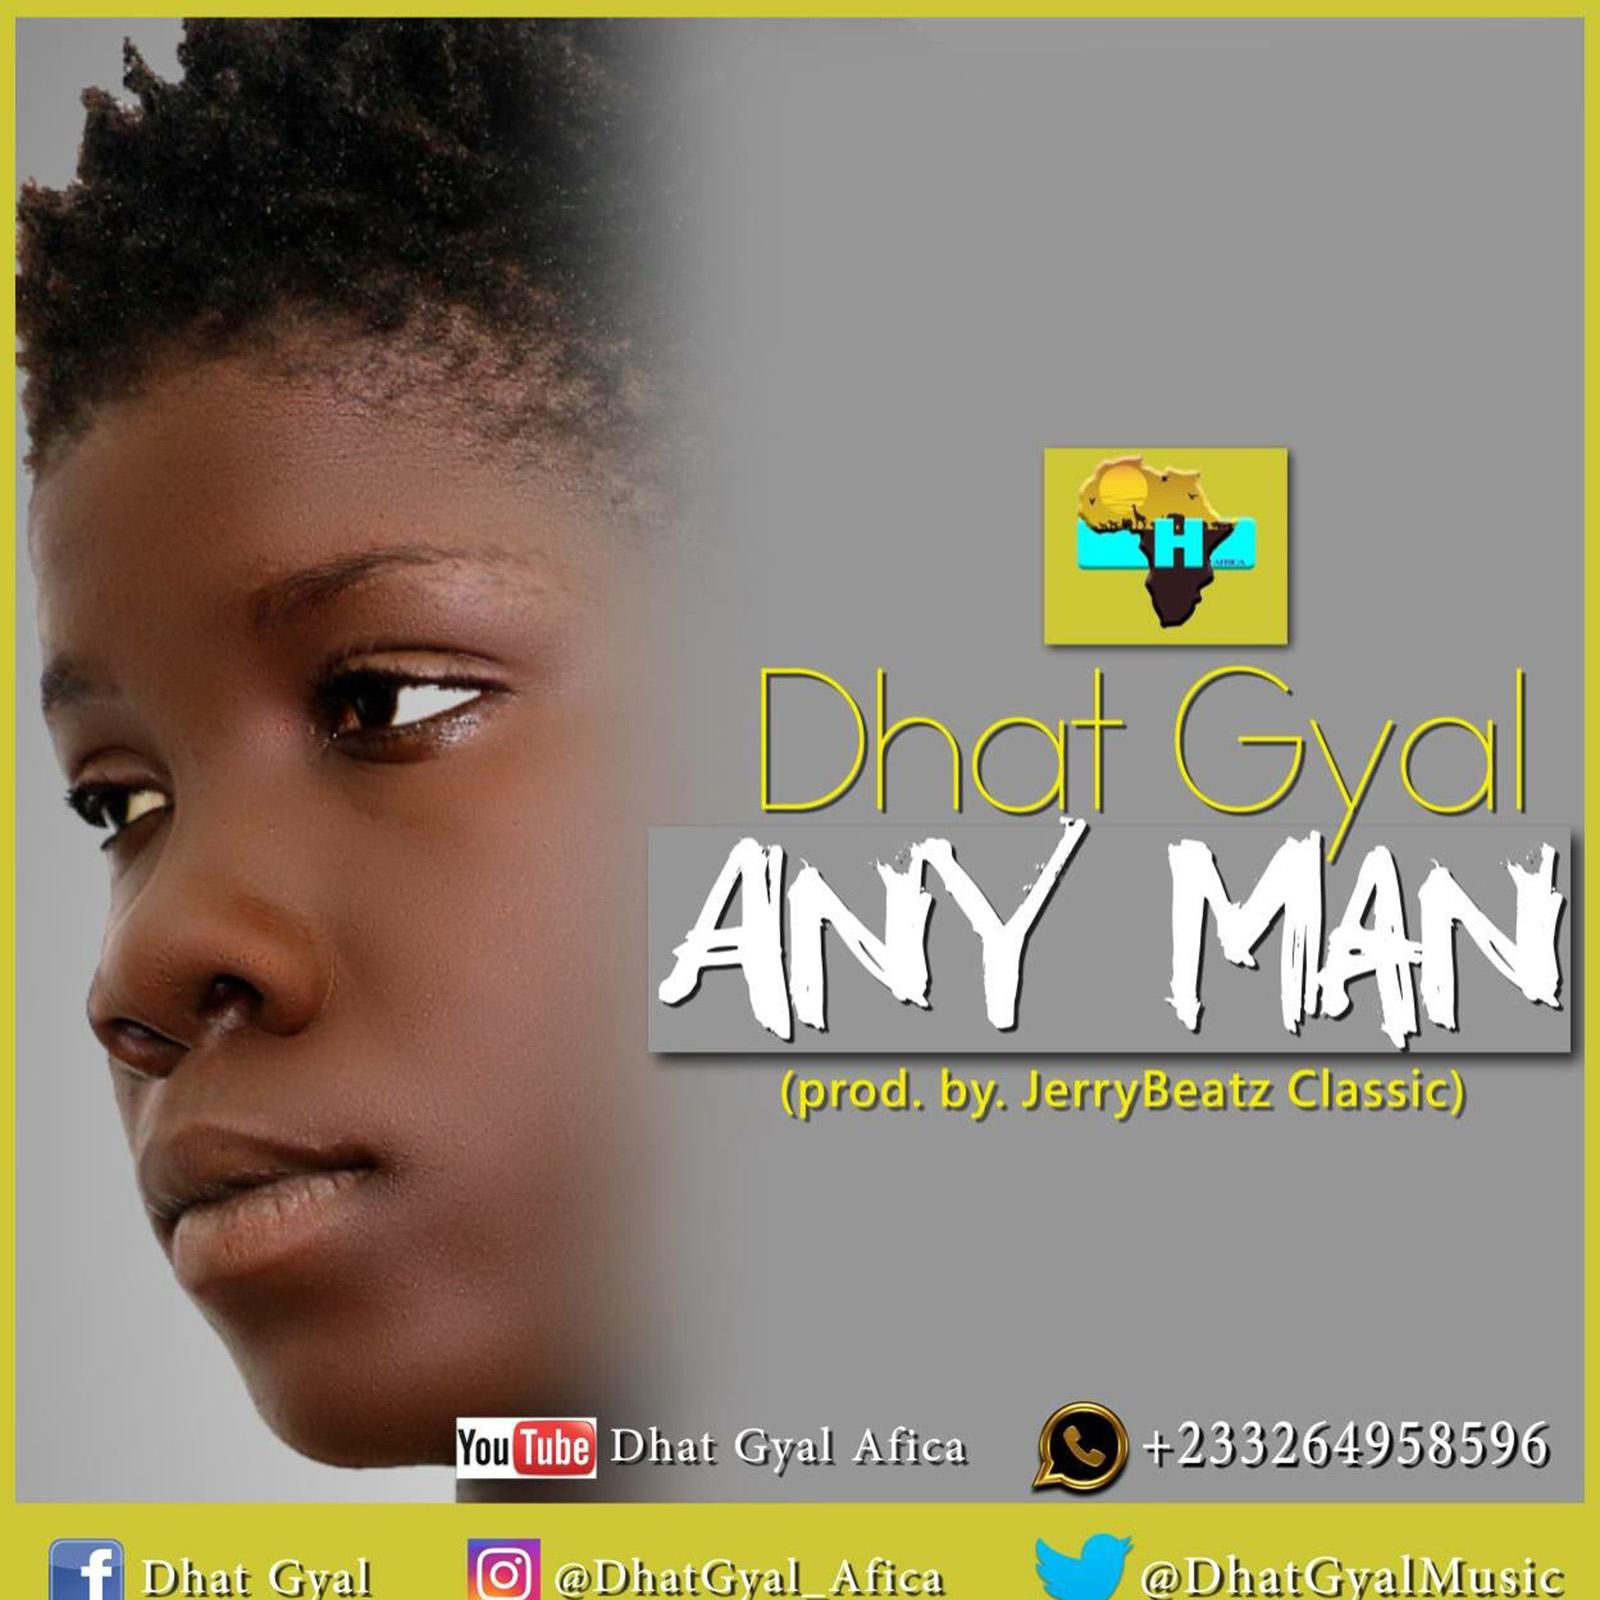 Any Man Na Man by Dhat Gyal